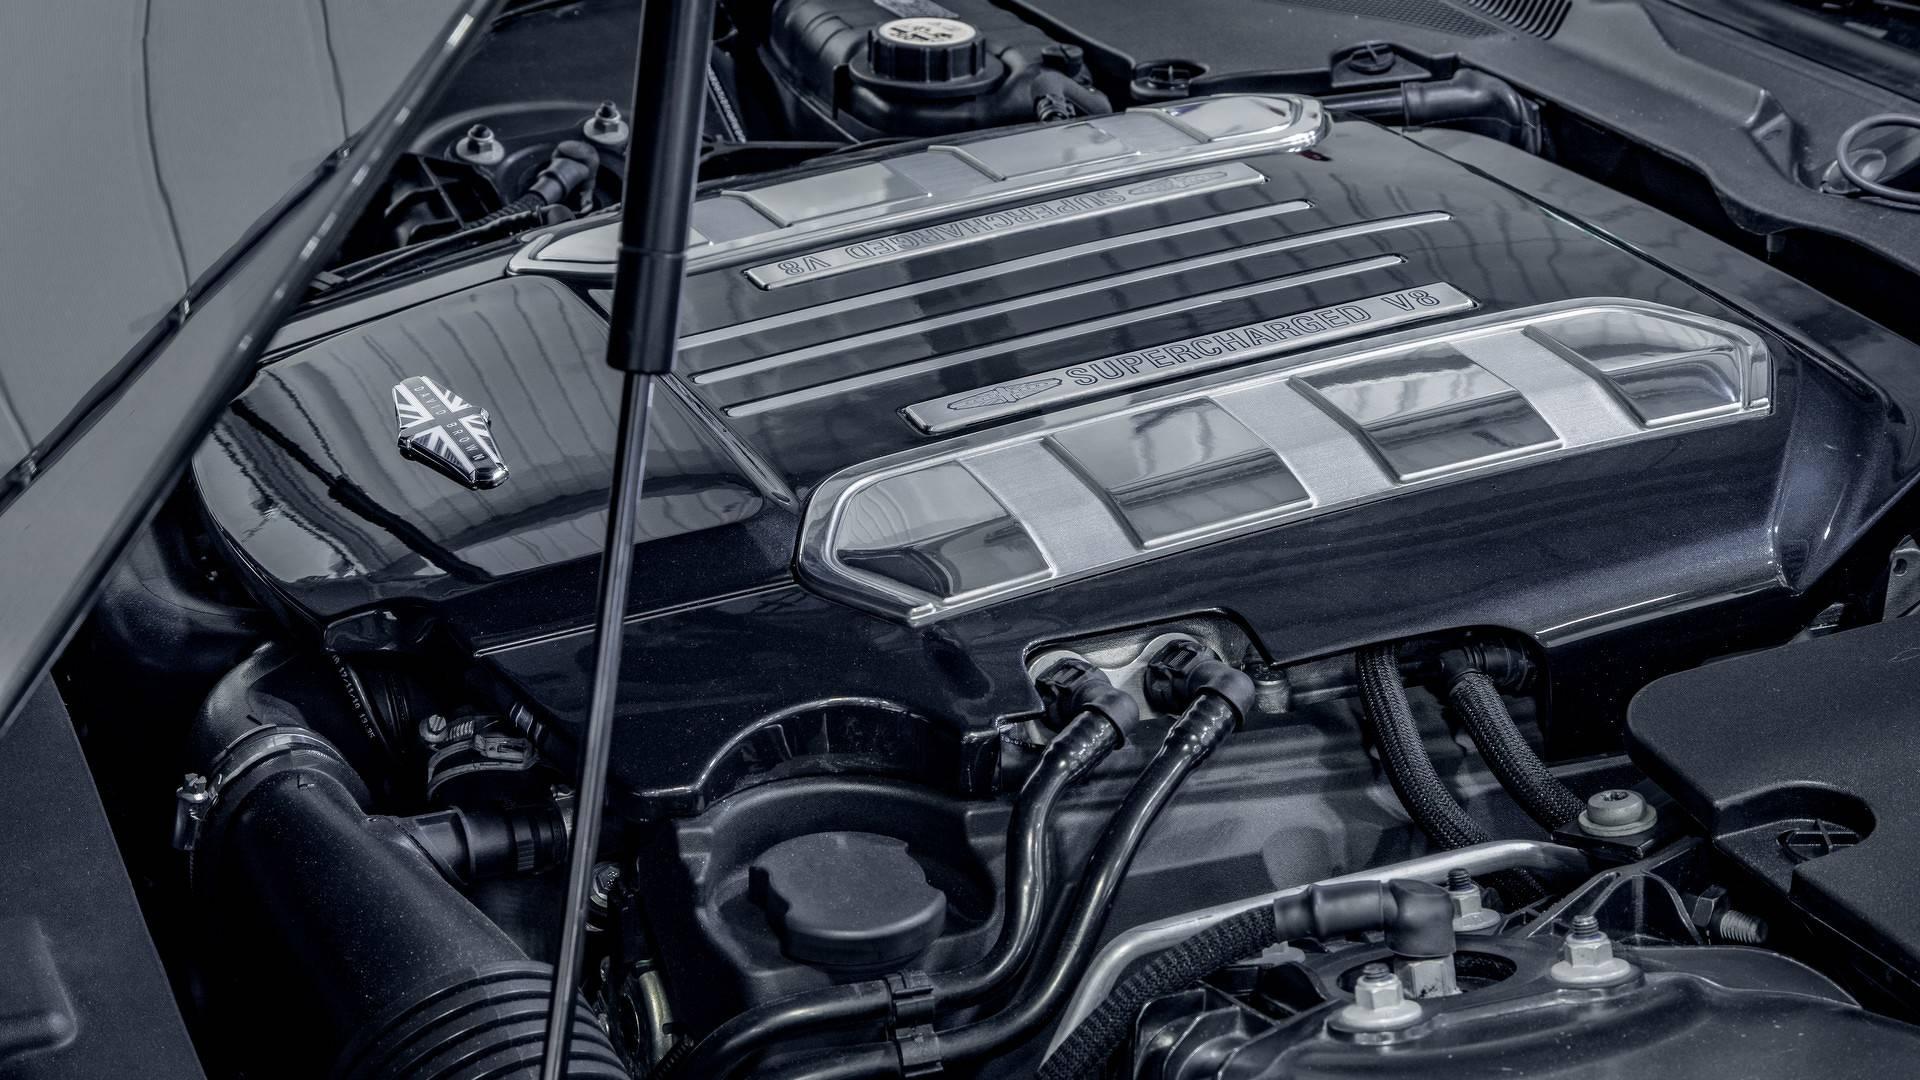 david-brown-automotive-speedback-silverstone-edition-6